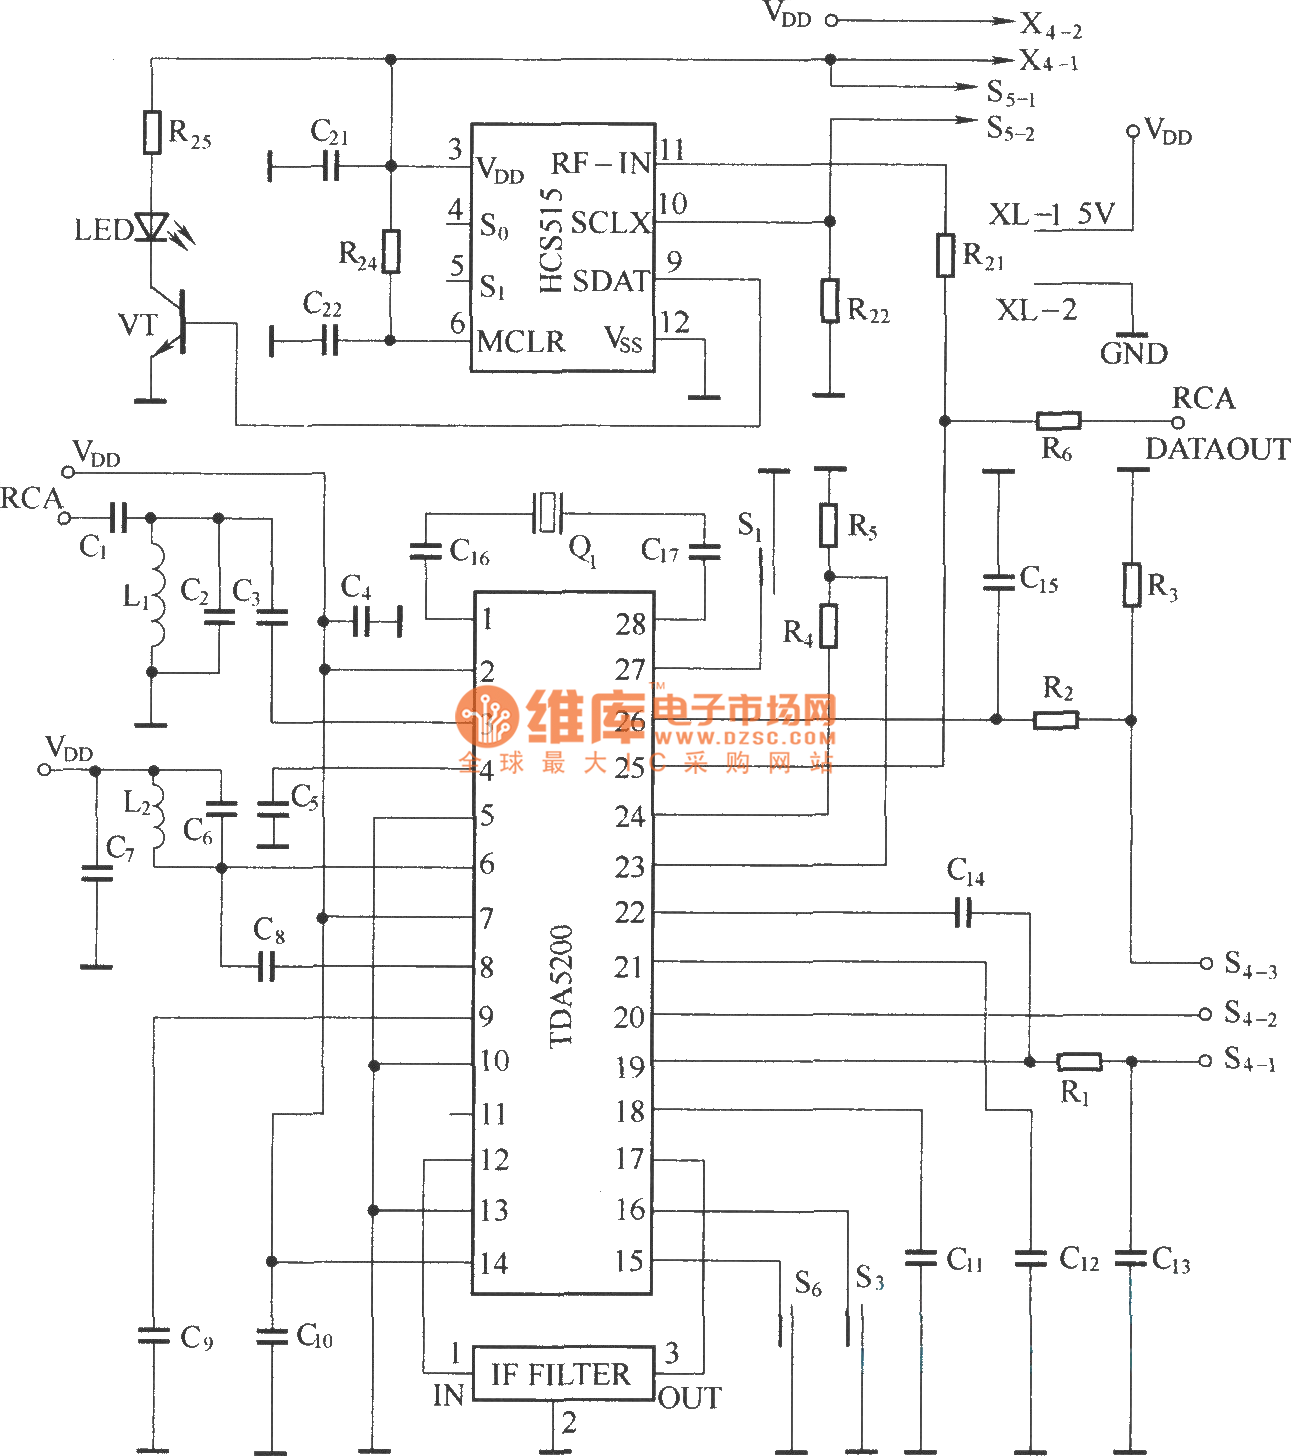 Heterodyne Remote Control Receiving Circuit Diagram Heartratemonitor Controlcircuit Seekic